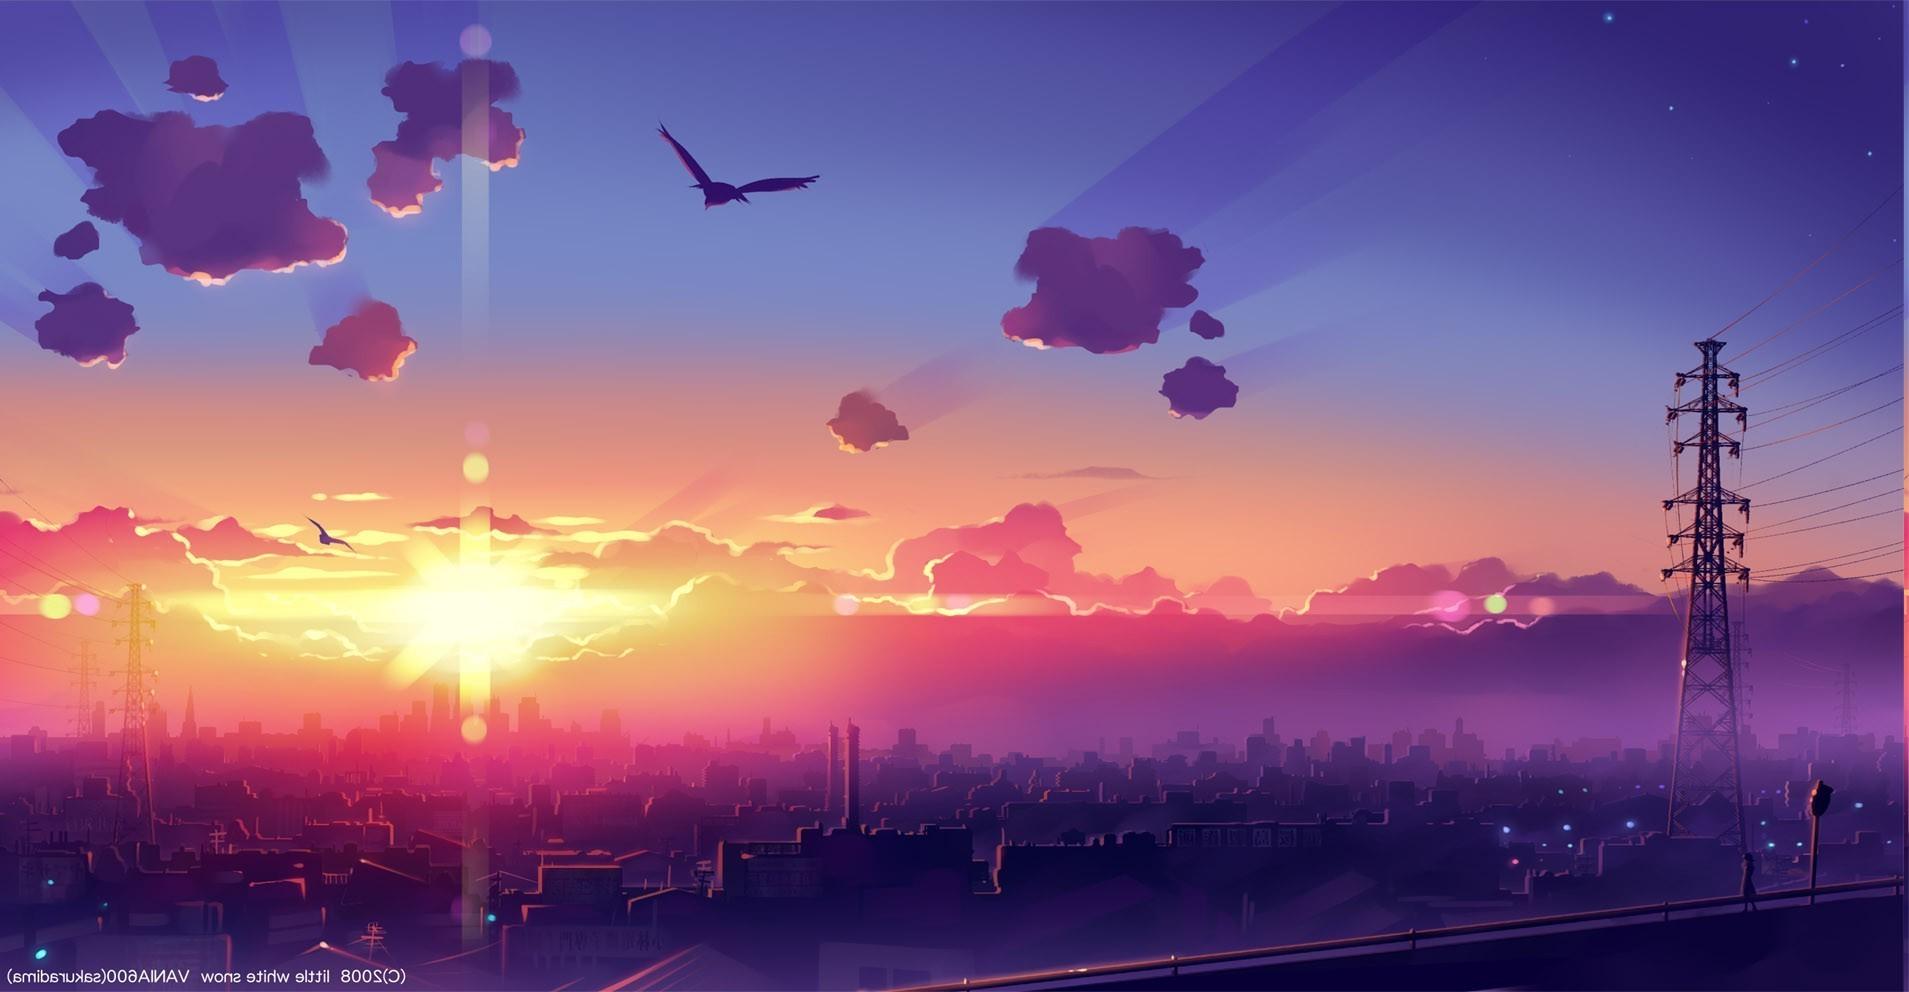 Sunset Architecture Anime Building Sky Sunrise Calm Manga Skyline Evening Morning Horizon Atmosphere Dusk Metropolis Cloud